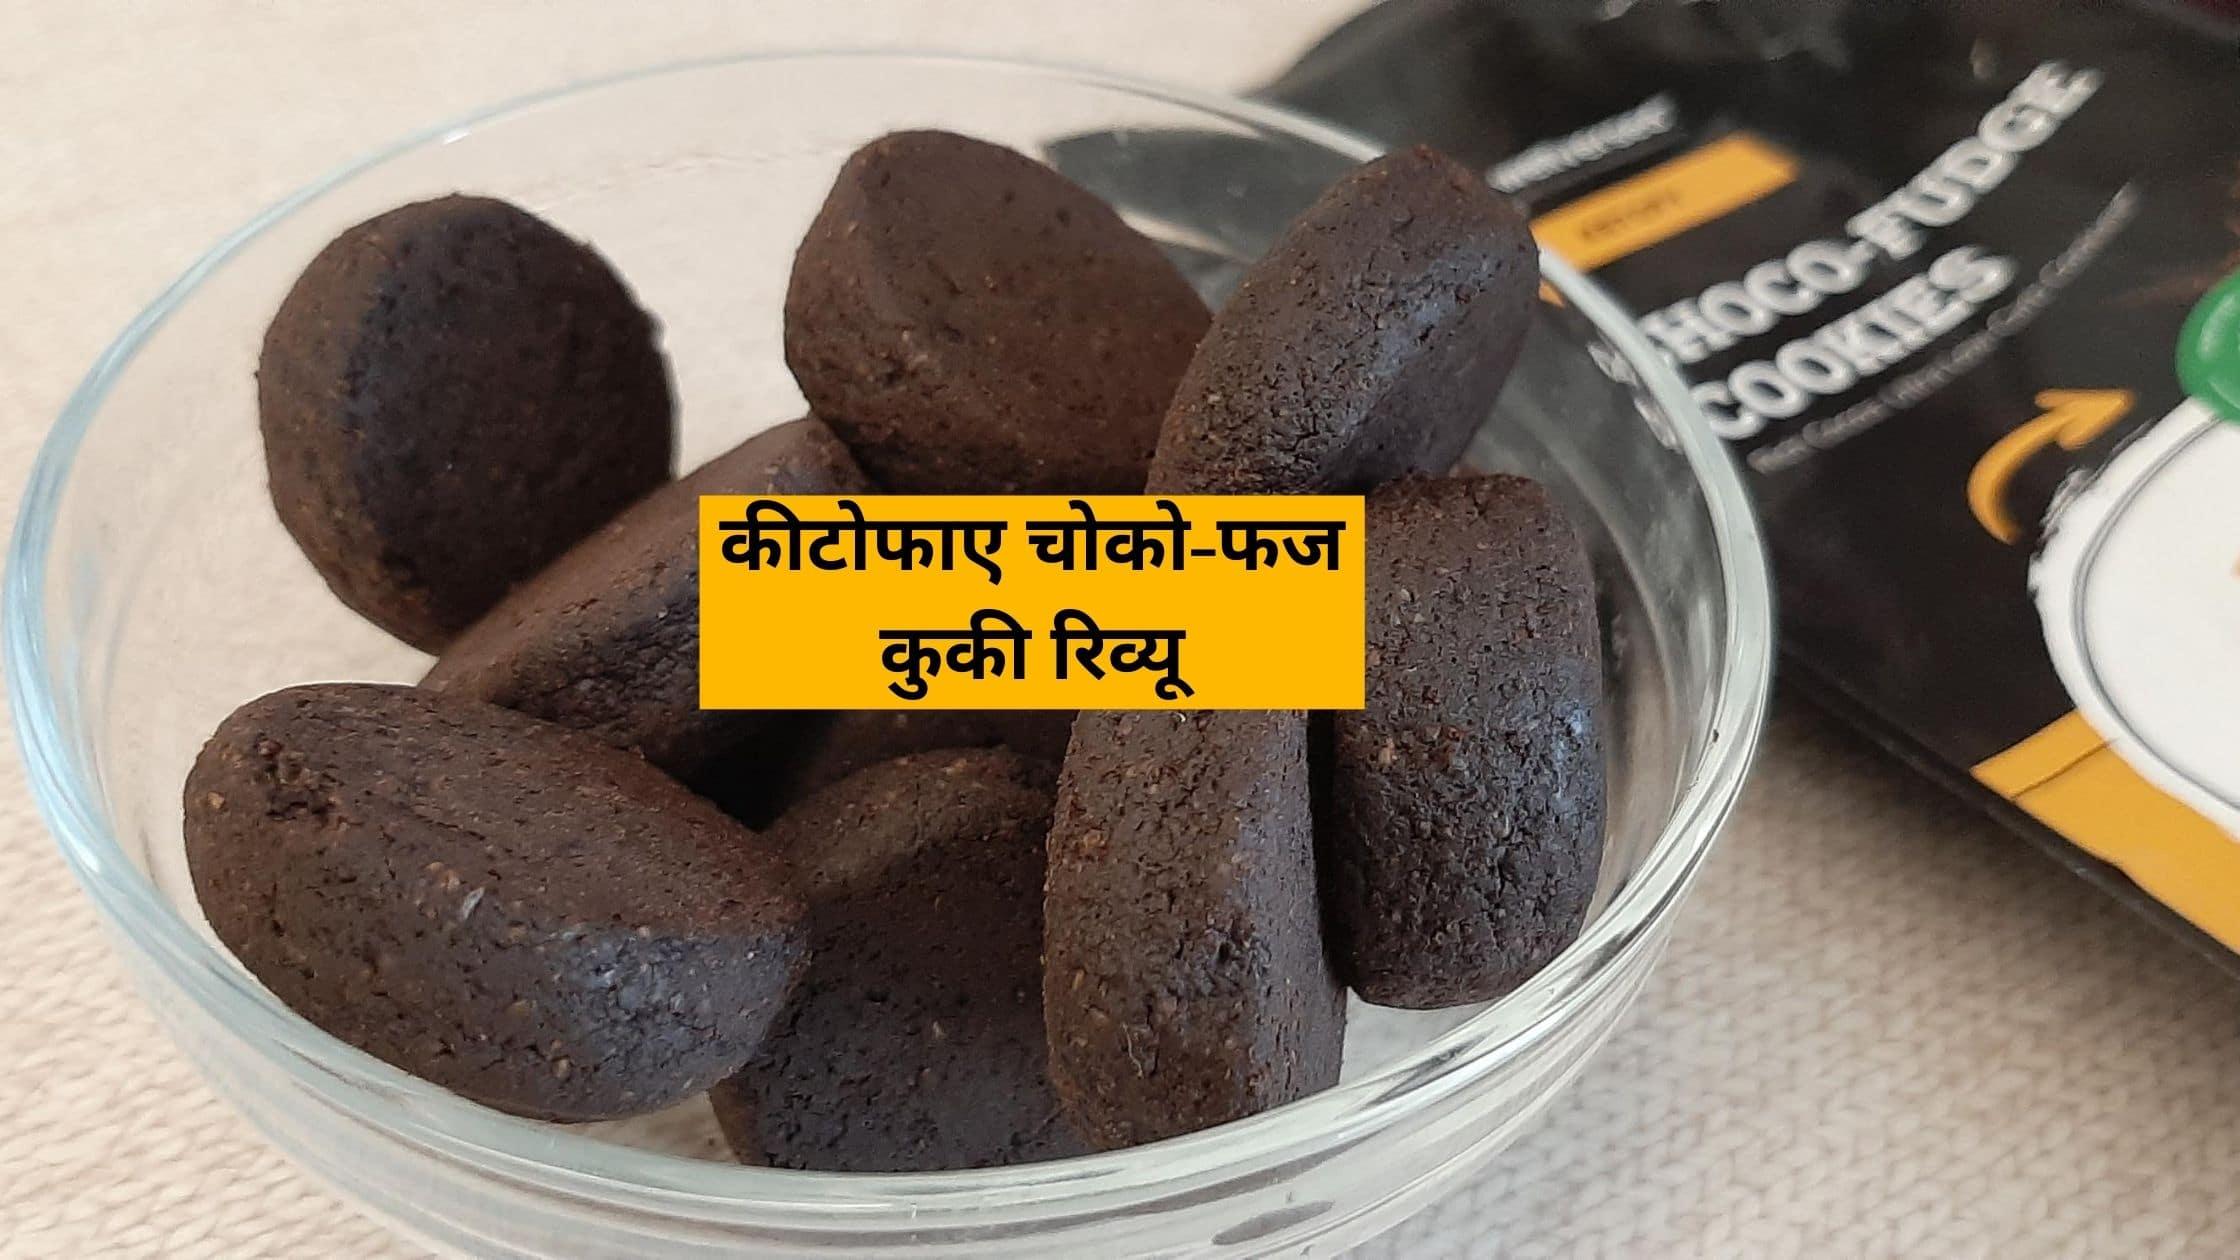 Ketofy Choco Fudge Cookies Review